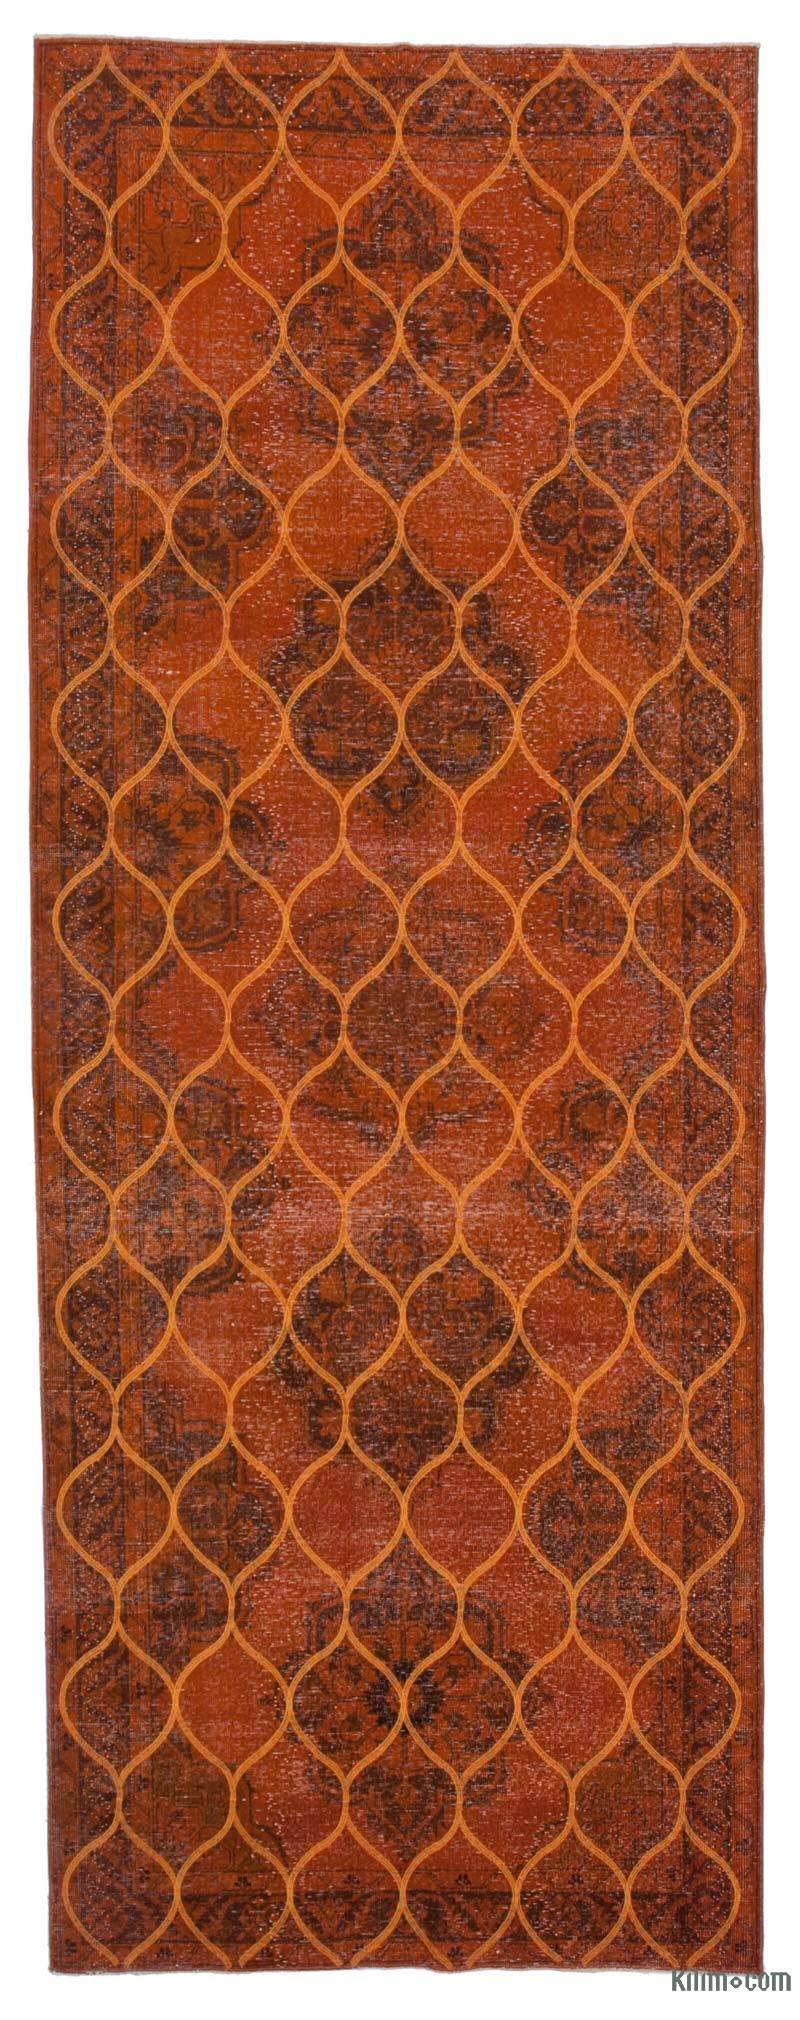 "Orange Embroidered Over-dyed Turkish Vintage Runner - 4' 10"" x 12' 10"" (58 in. x 154 in.) - K0038775"